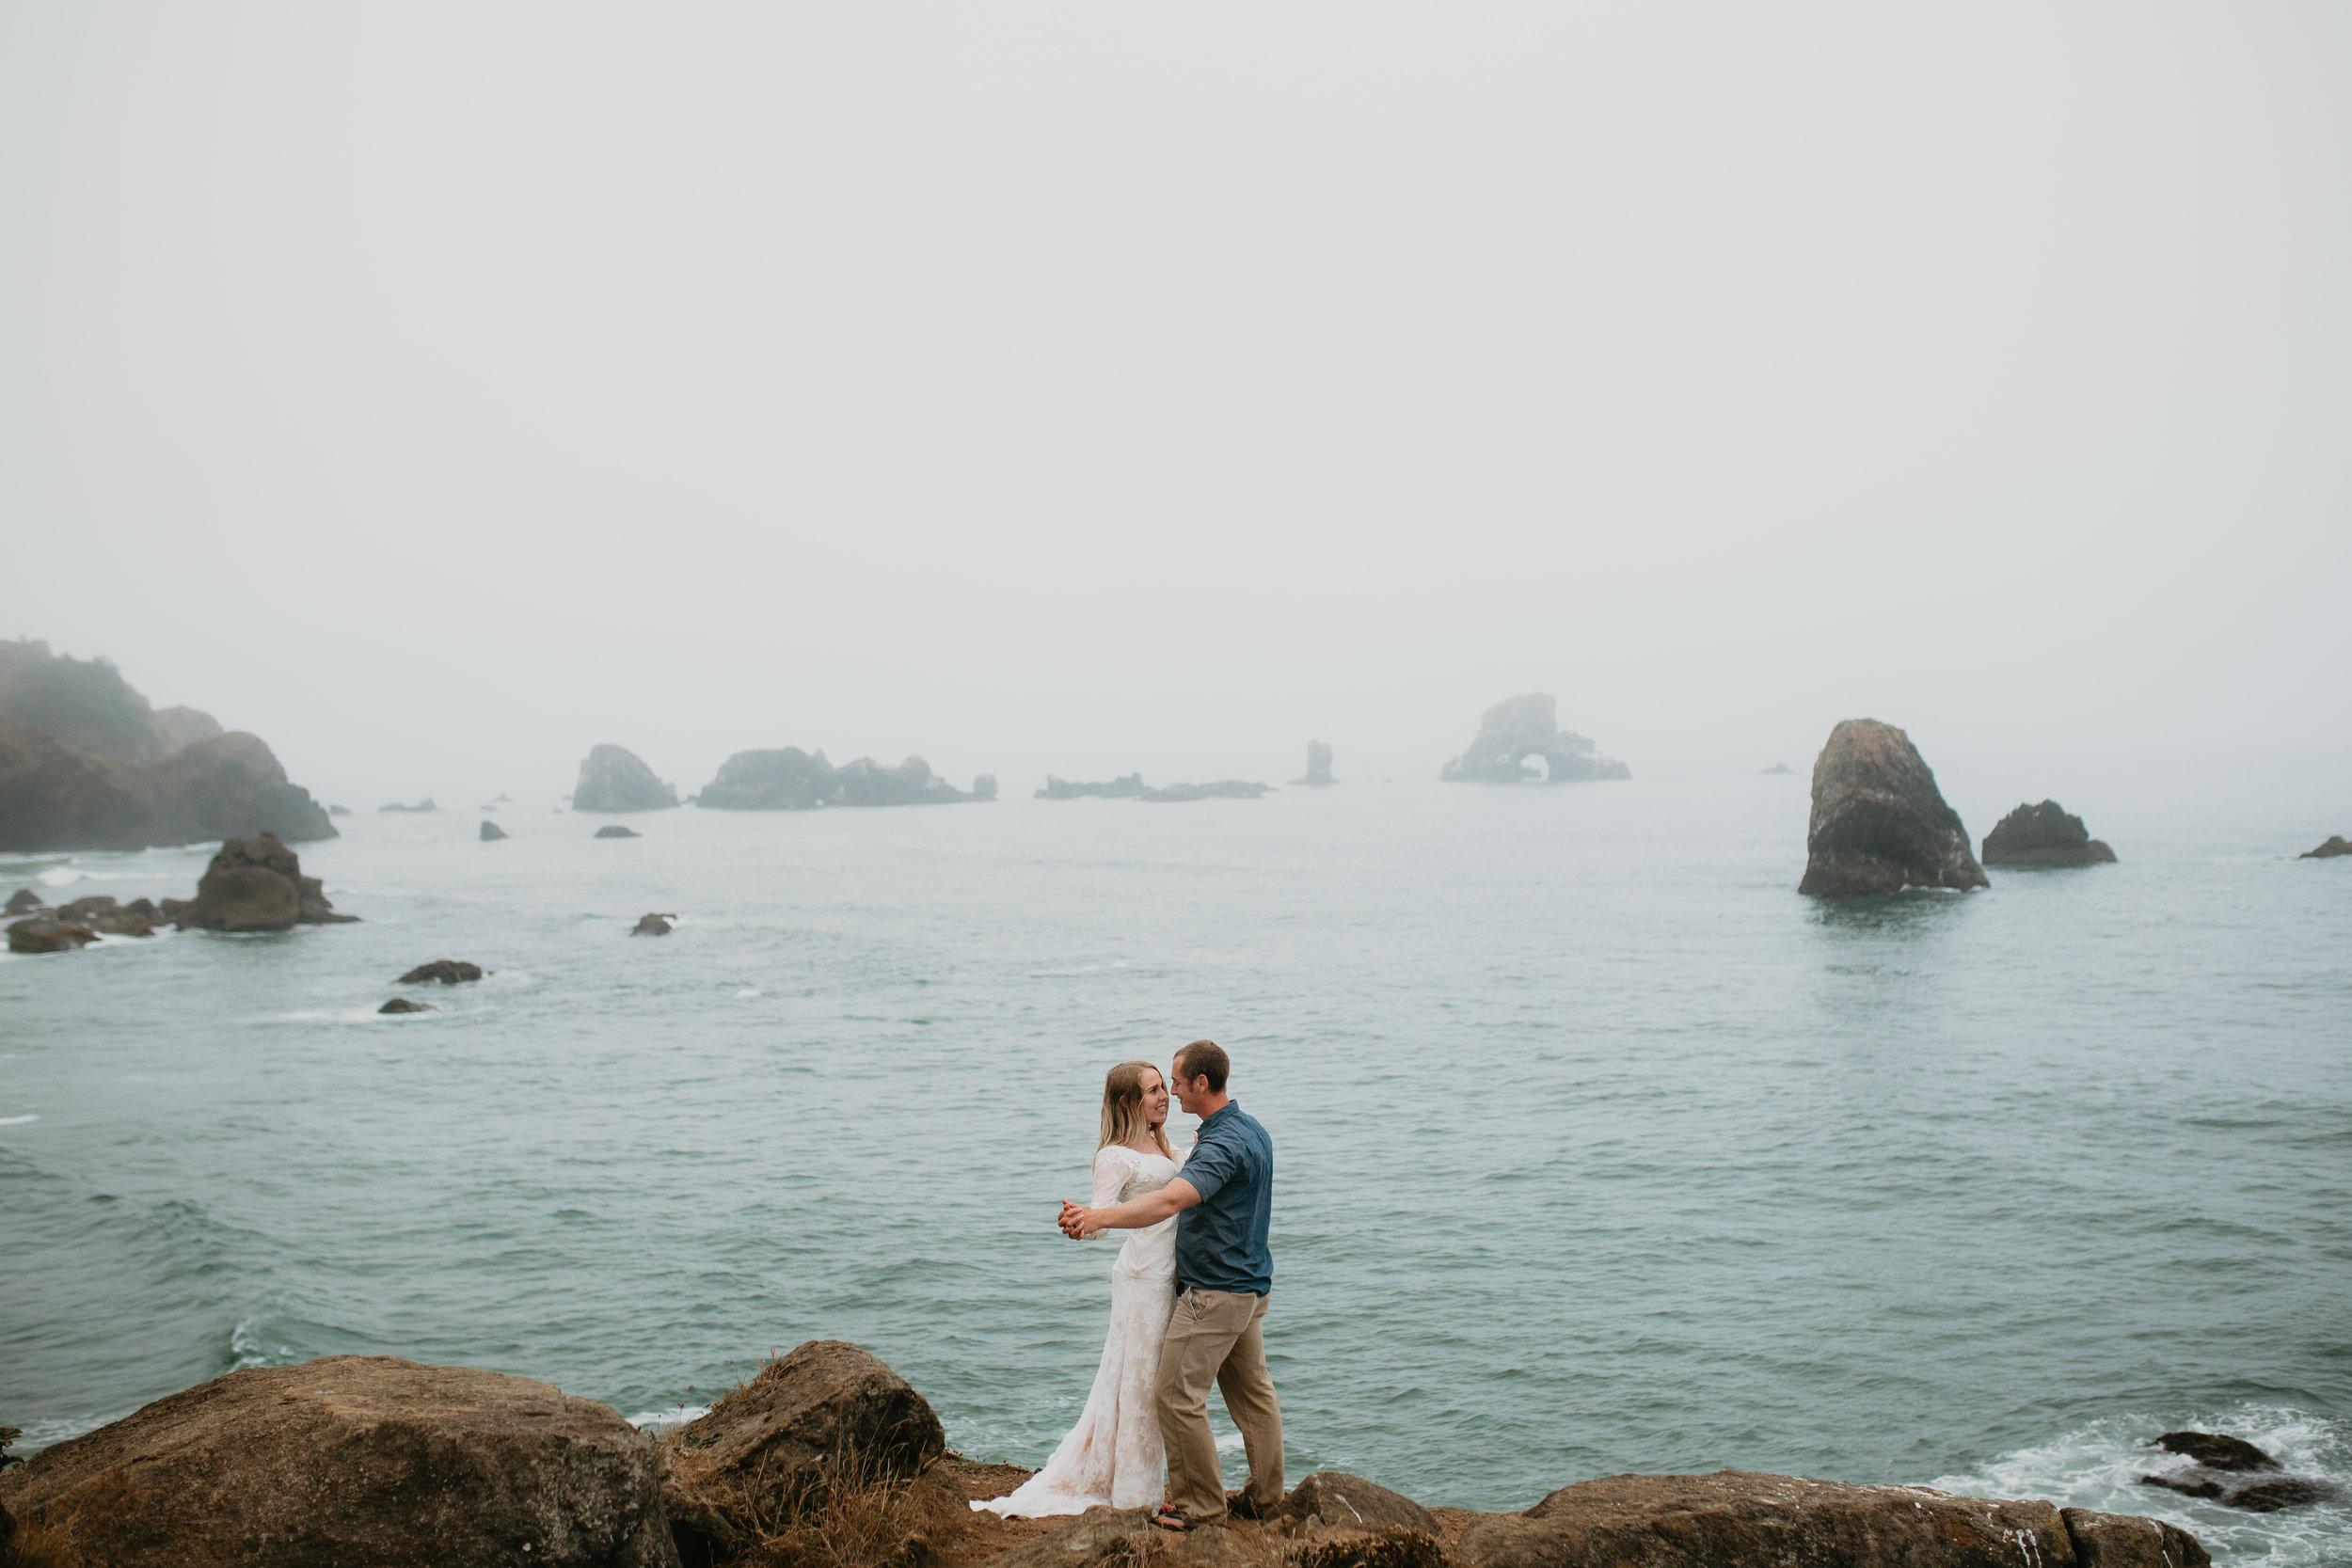 nicole-daacke-photography-ecola-state-park-oregon-elopement-bridal-photos-photographer-for-cannon-beach-elopement-oregon-coast-elopement-photographer-foggy-summer-elopement-cannon-beach-best-adventure-elopement-photographer-6984.jpg